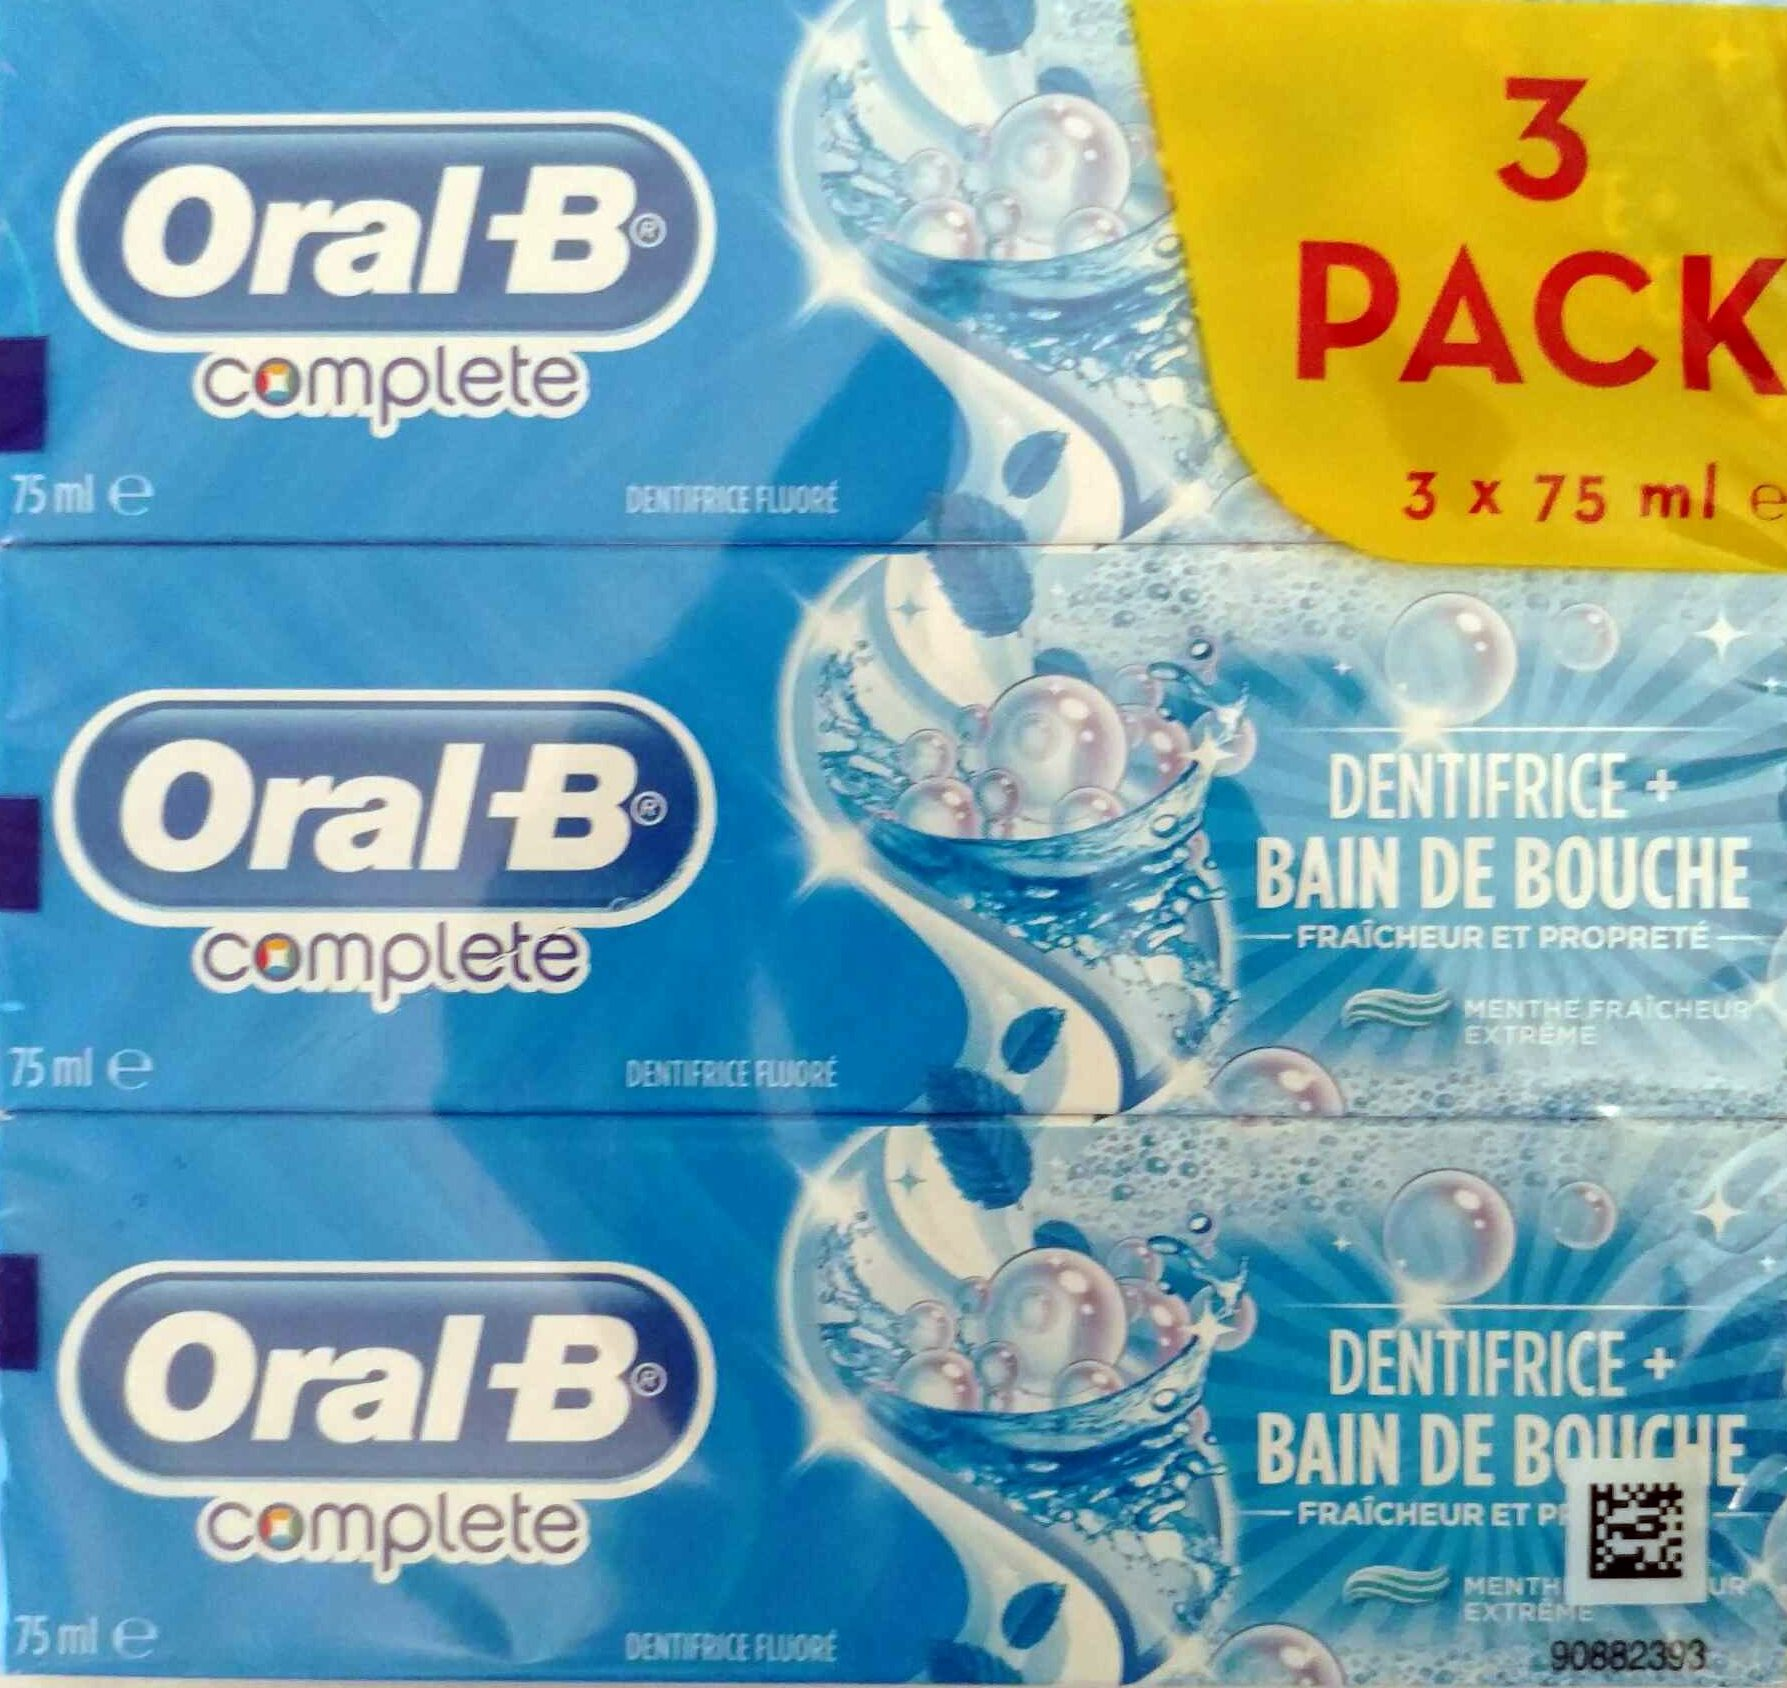 Complete dentifrice + bain de bouche (3 Pack) - Product